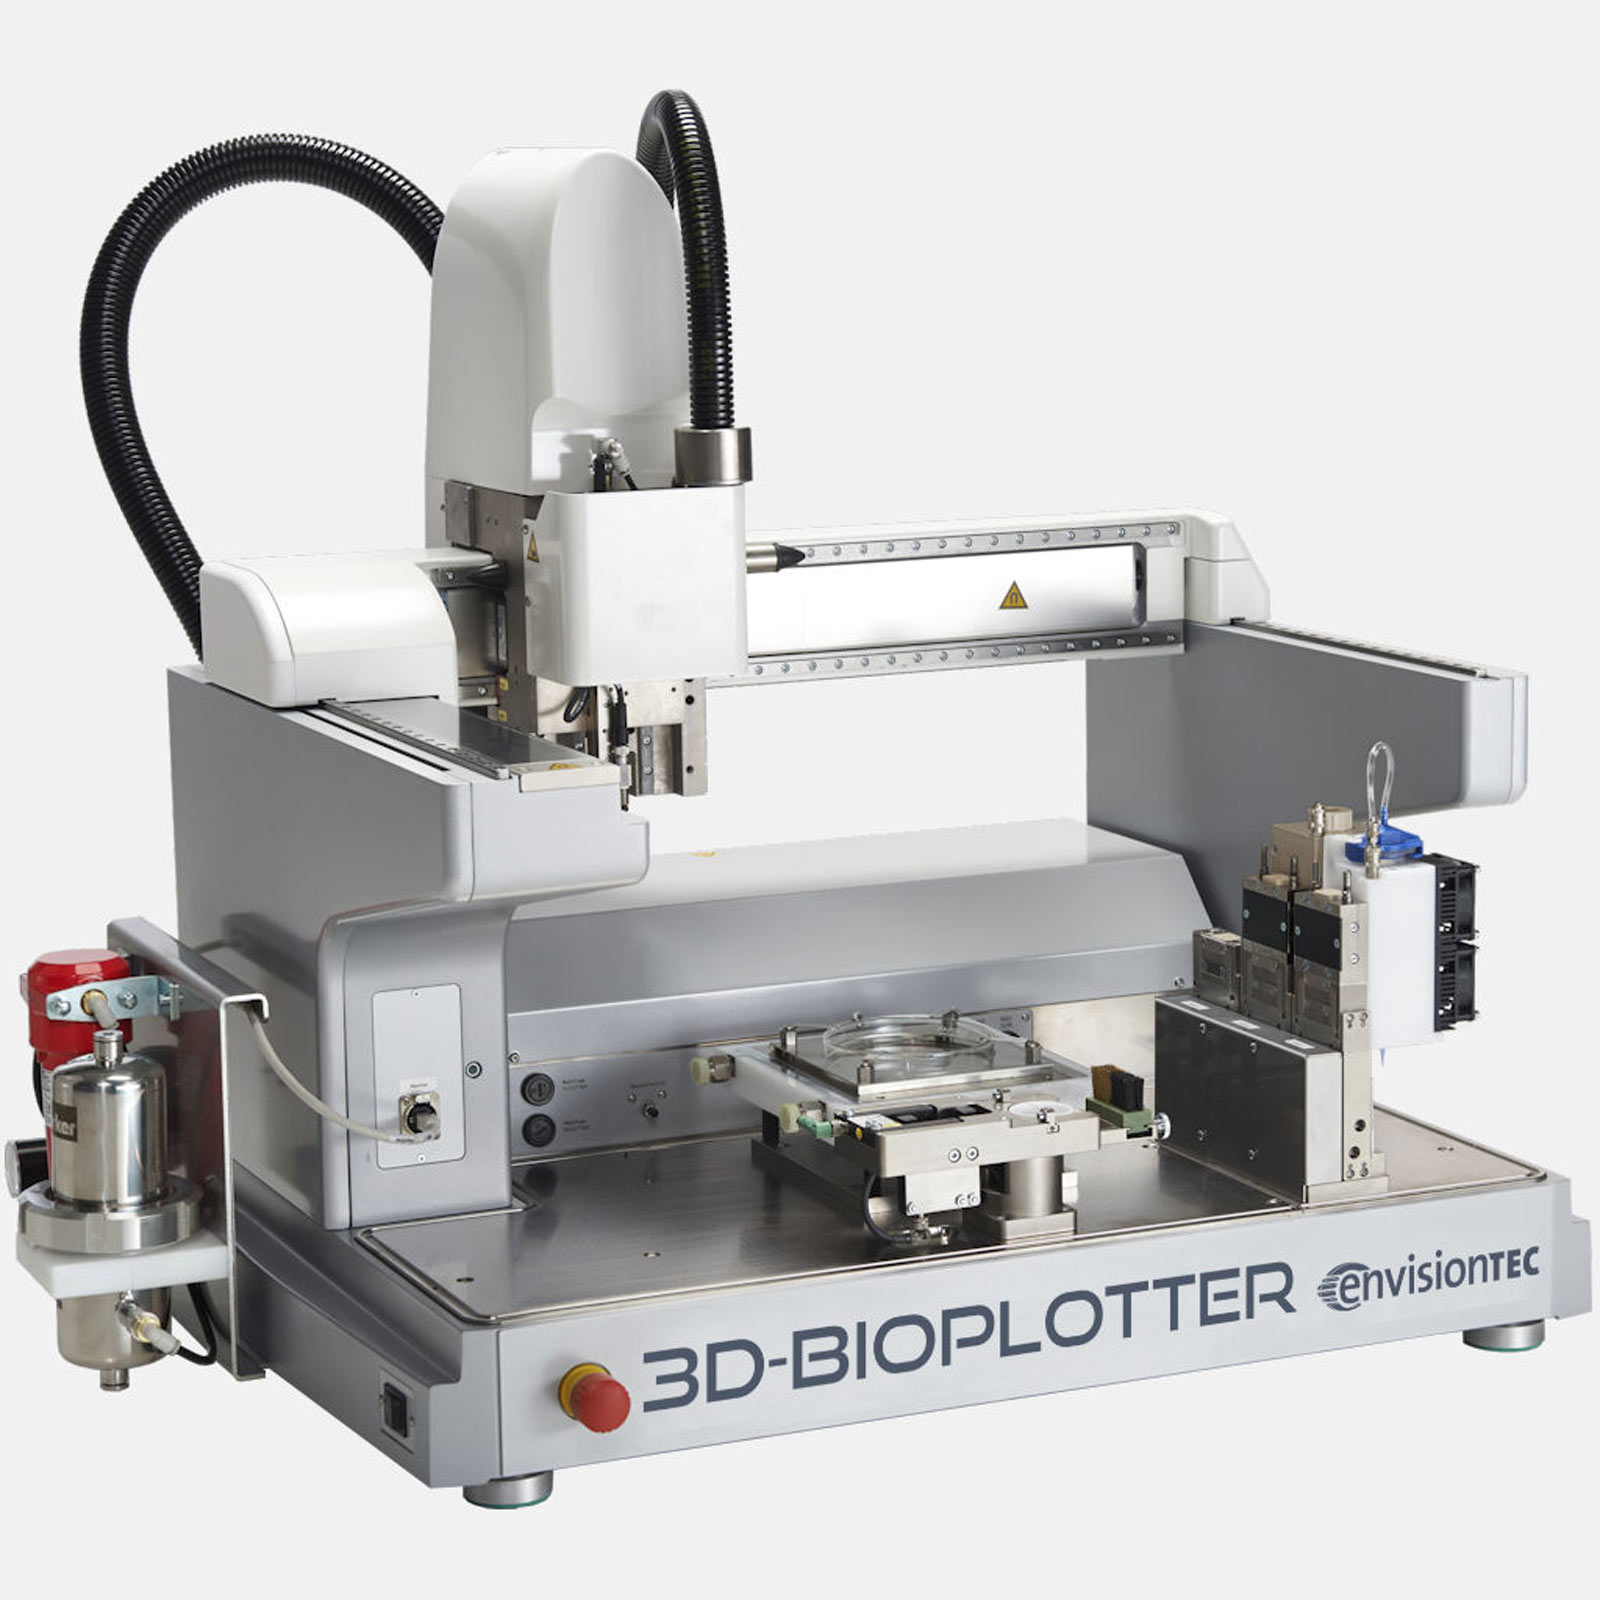 The EnvisionTEC 3D-Bioplotter. Image via EnvisionTEC.